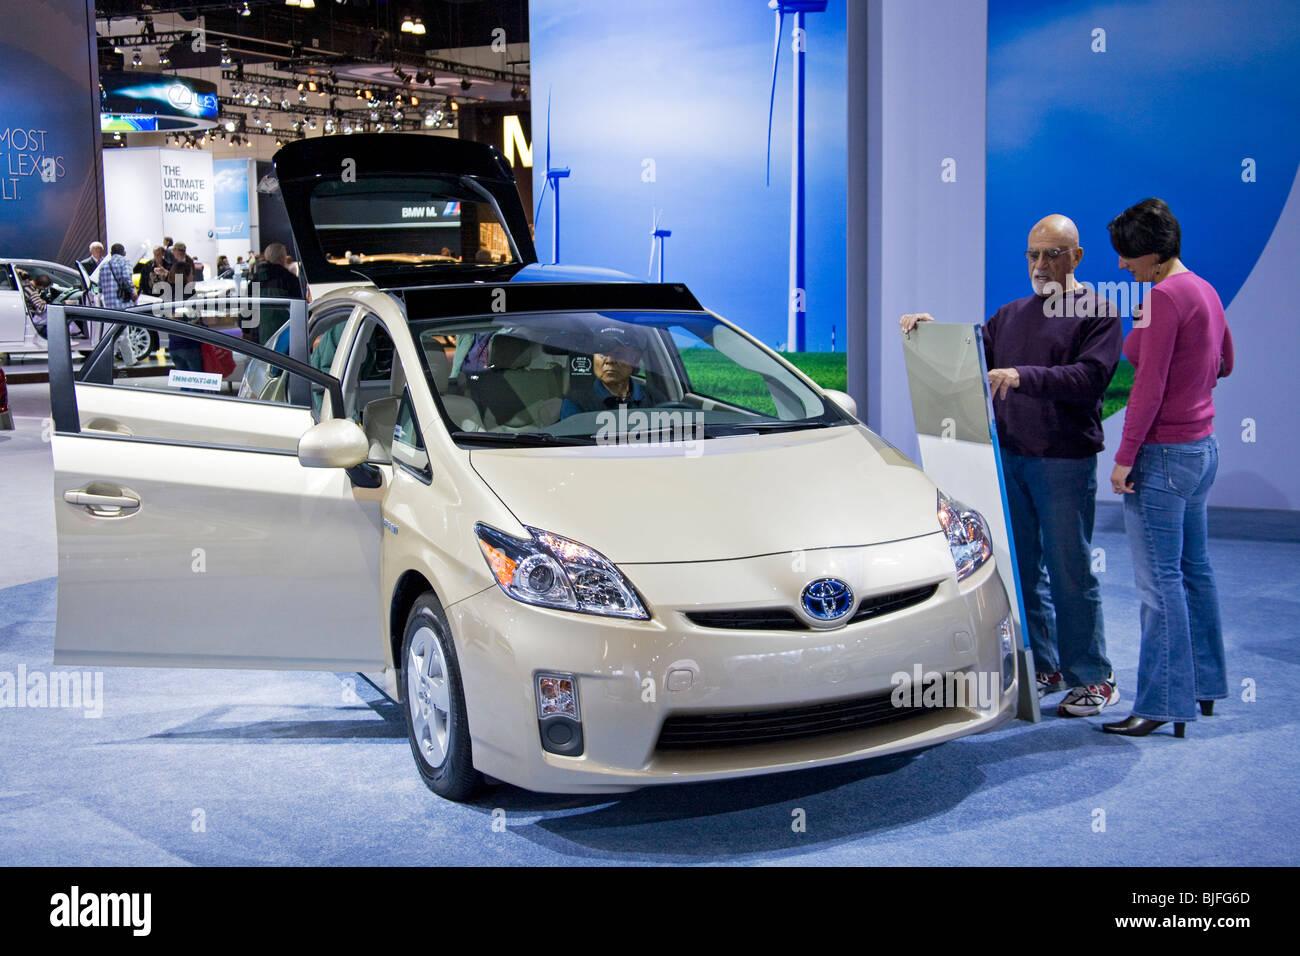 Toyota Prius. Alternative Fuel Vehicles at 2009 Los Angeles Auto Show, LA Convention Center, California, USA - Stock Image